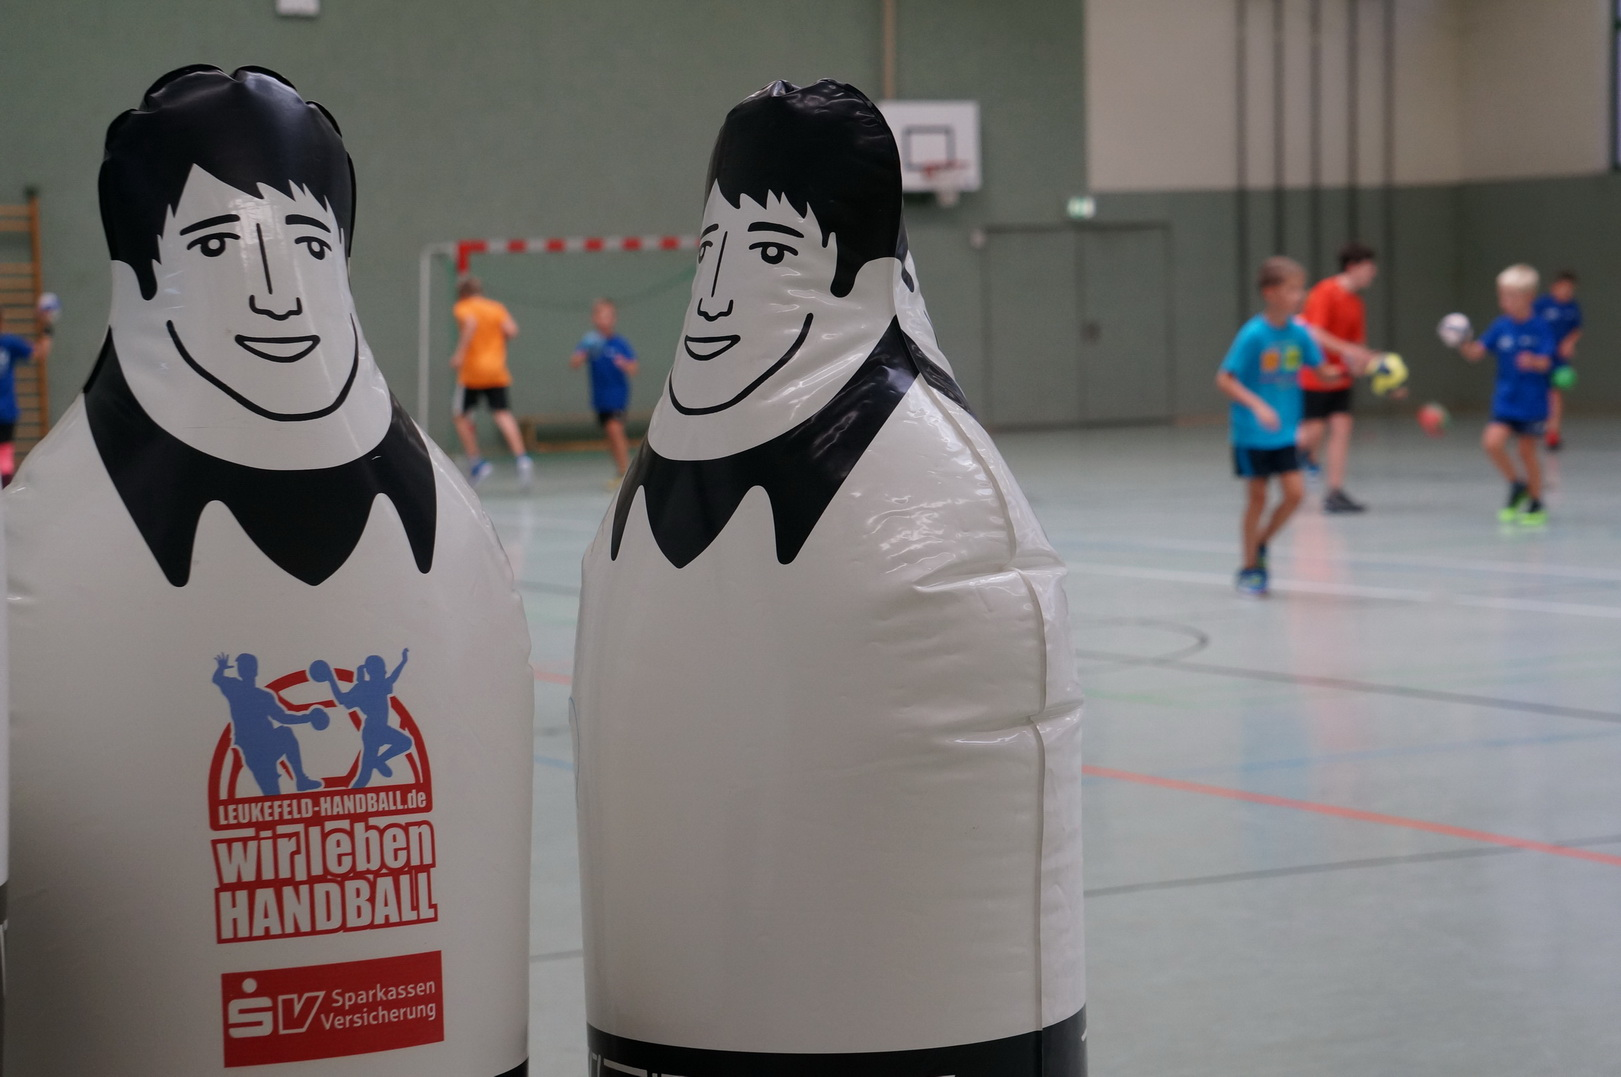 201808_Handballcamp_SDH_MG_157w